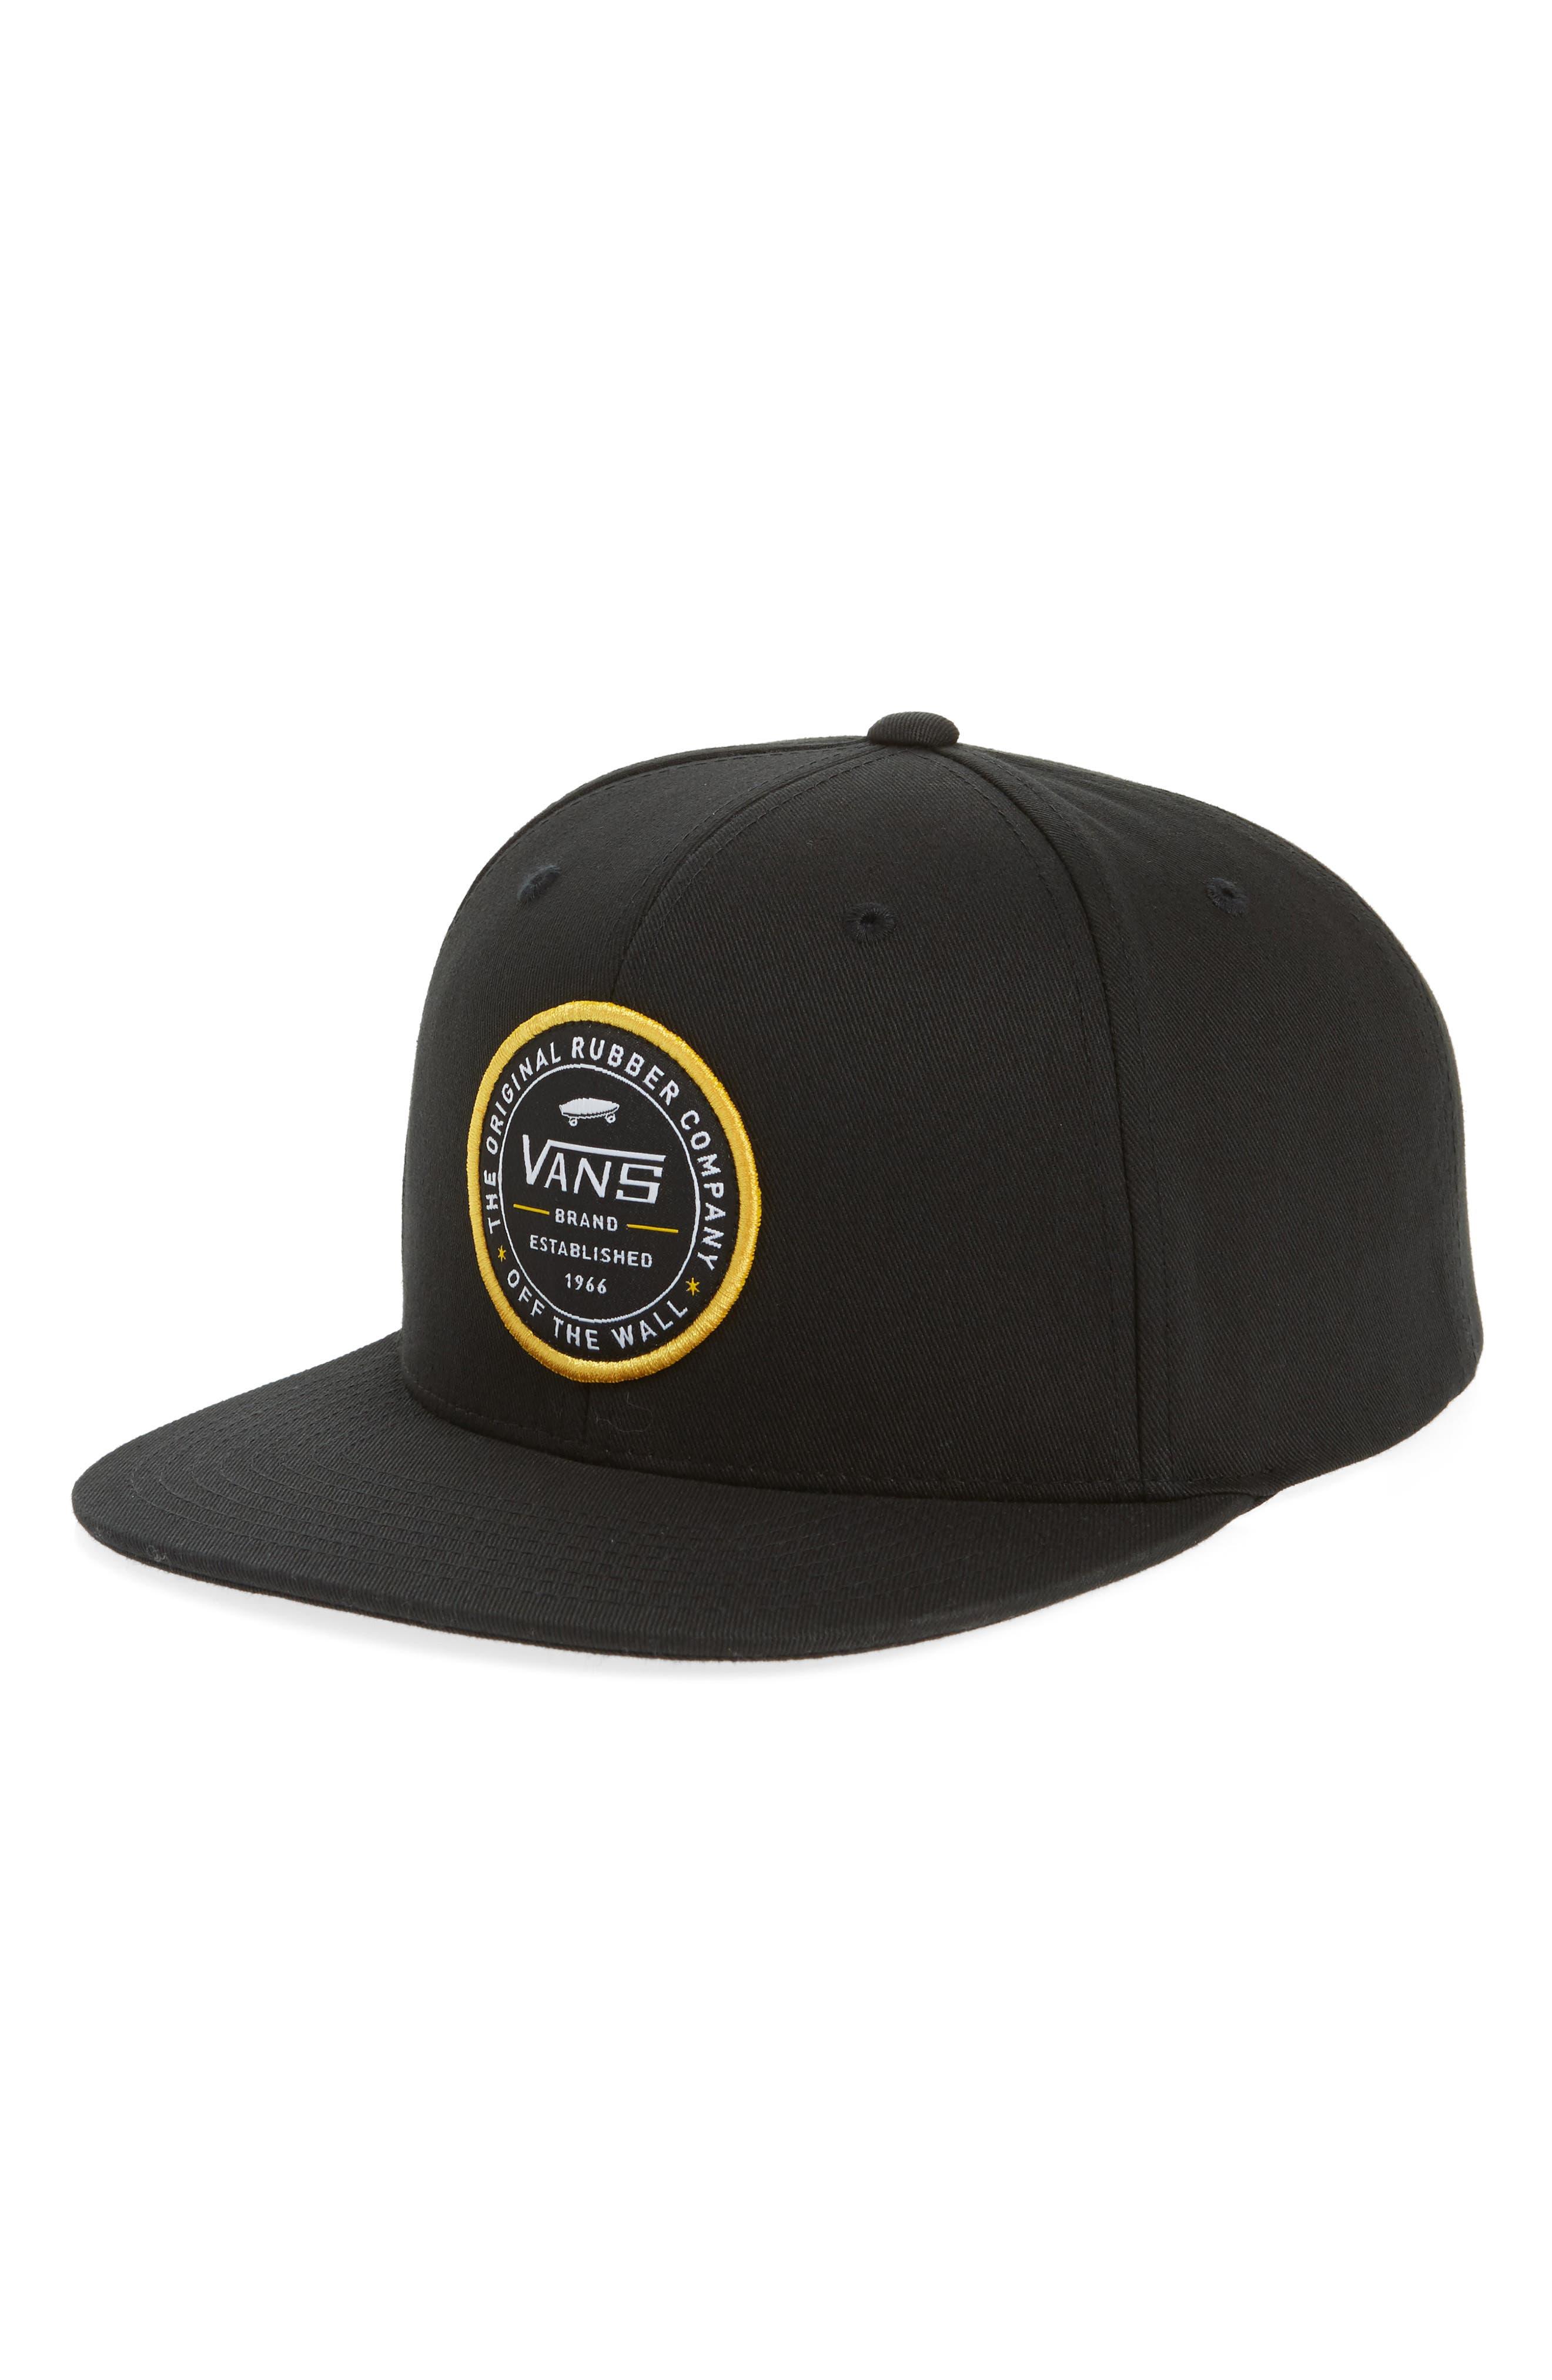 Established 66 Snapback Baseball Cap,                             Main thumbnail 1, color,                             001